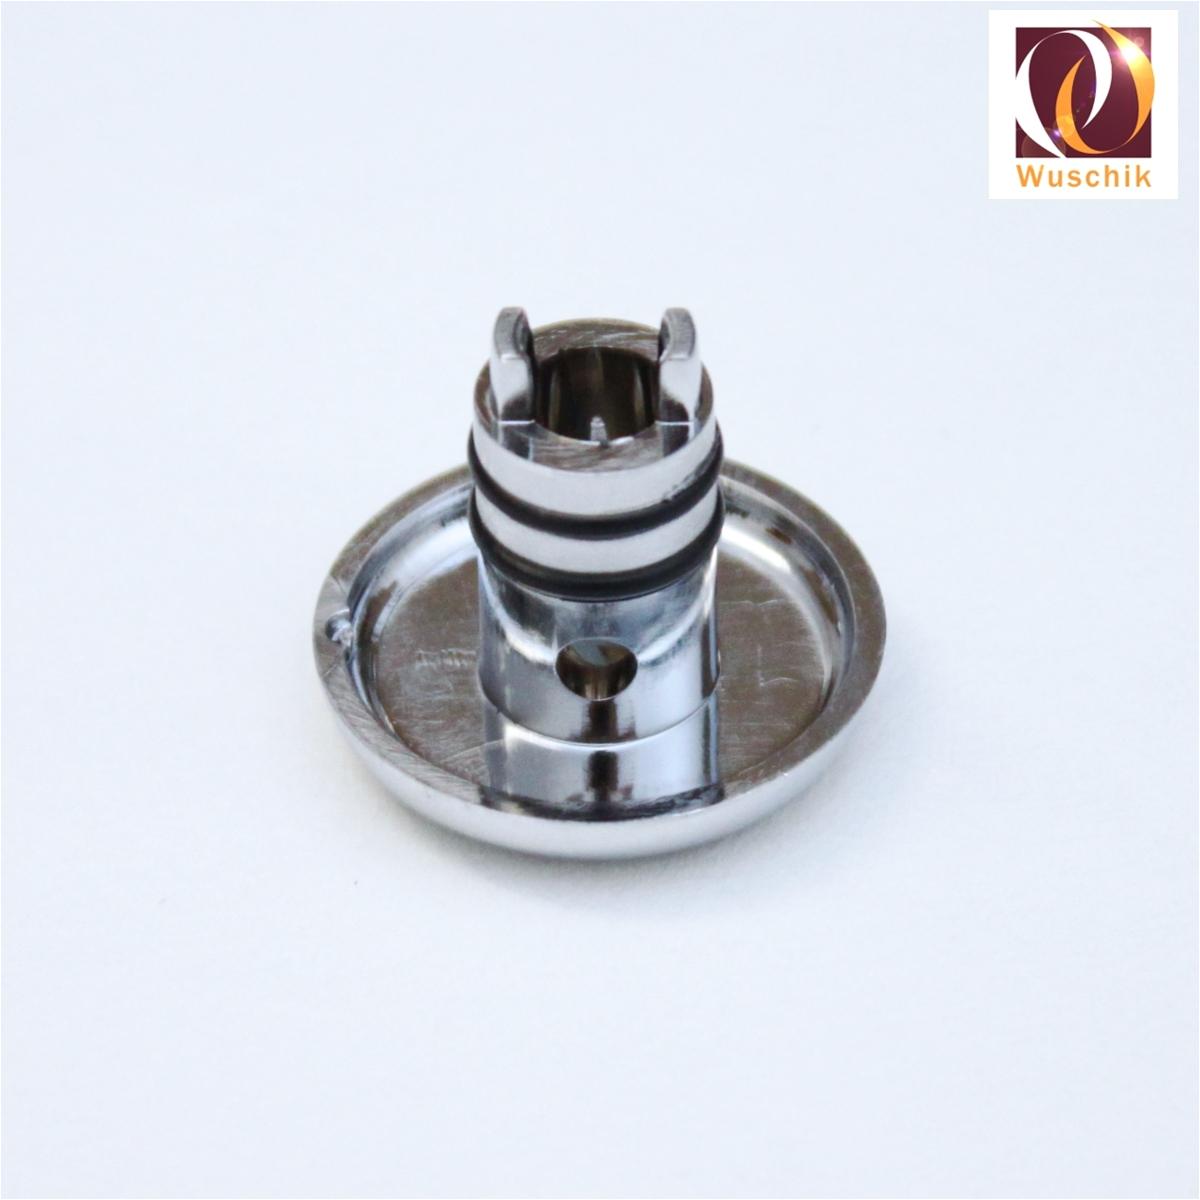 27 mm air buttom jet whirlpool bathtub cap replacement chrome